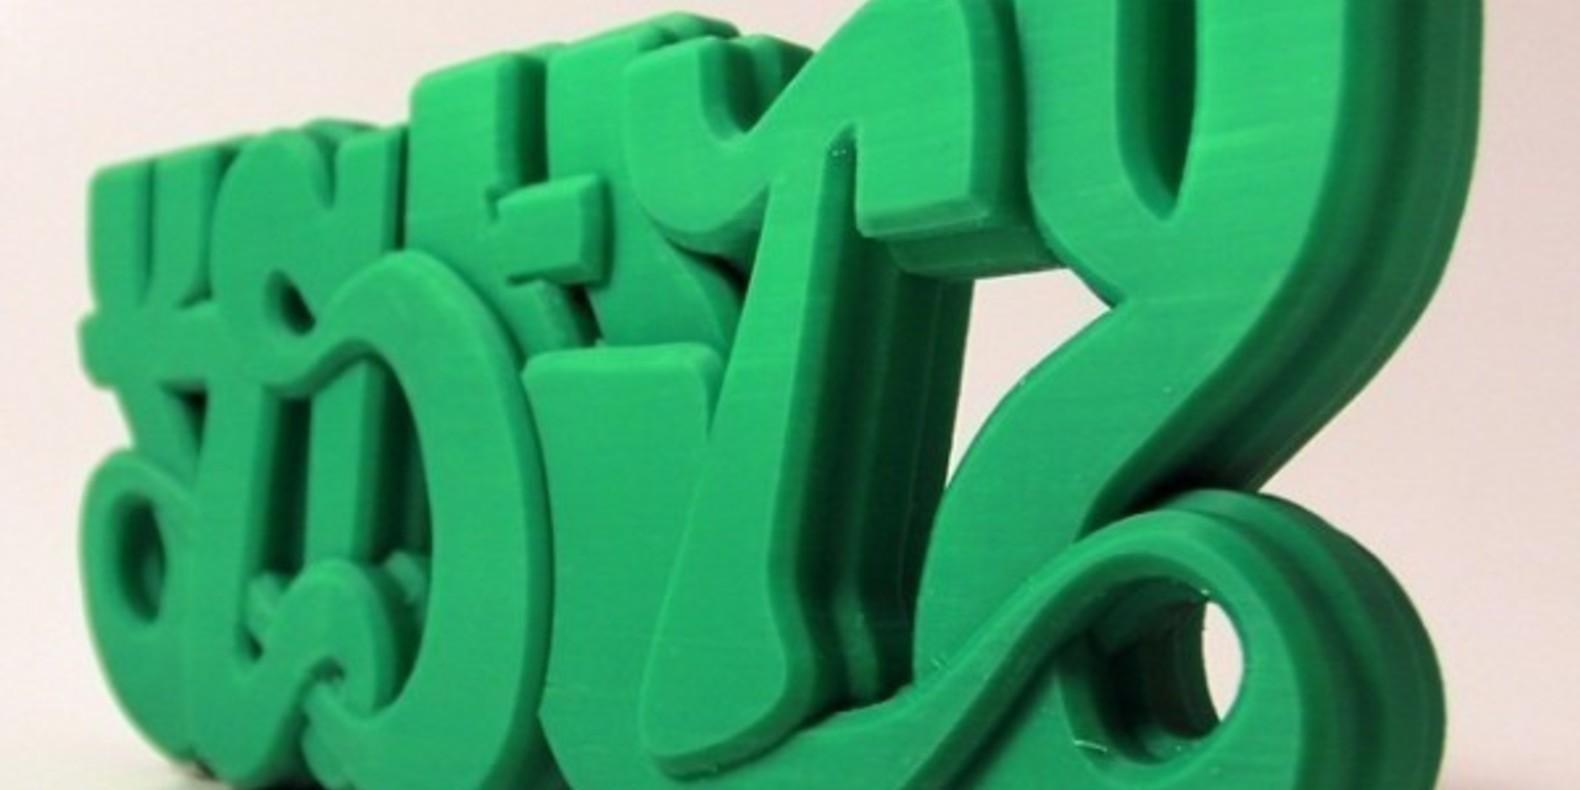 10-KUSHTY-3DPrint graffitis imprimés en 3D Noramlly Ben